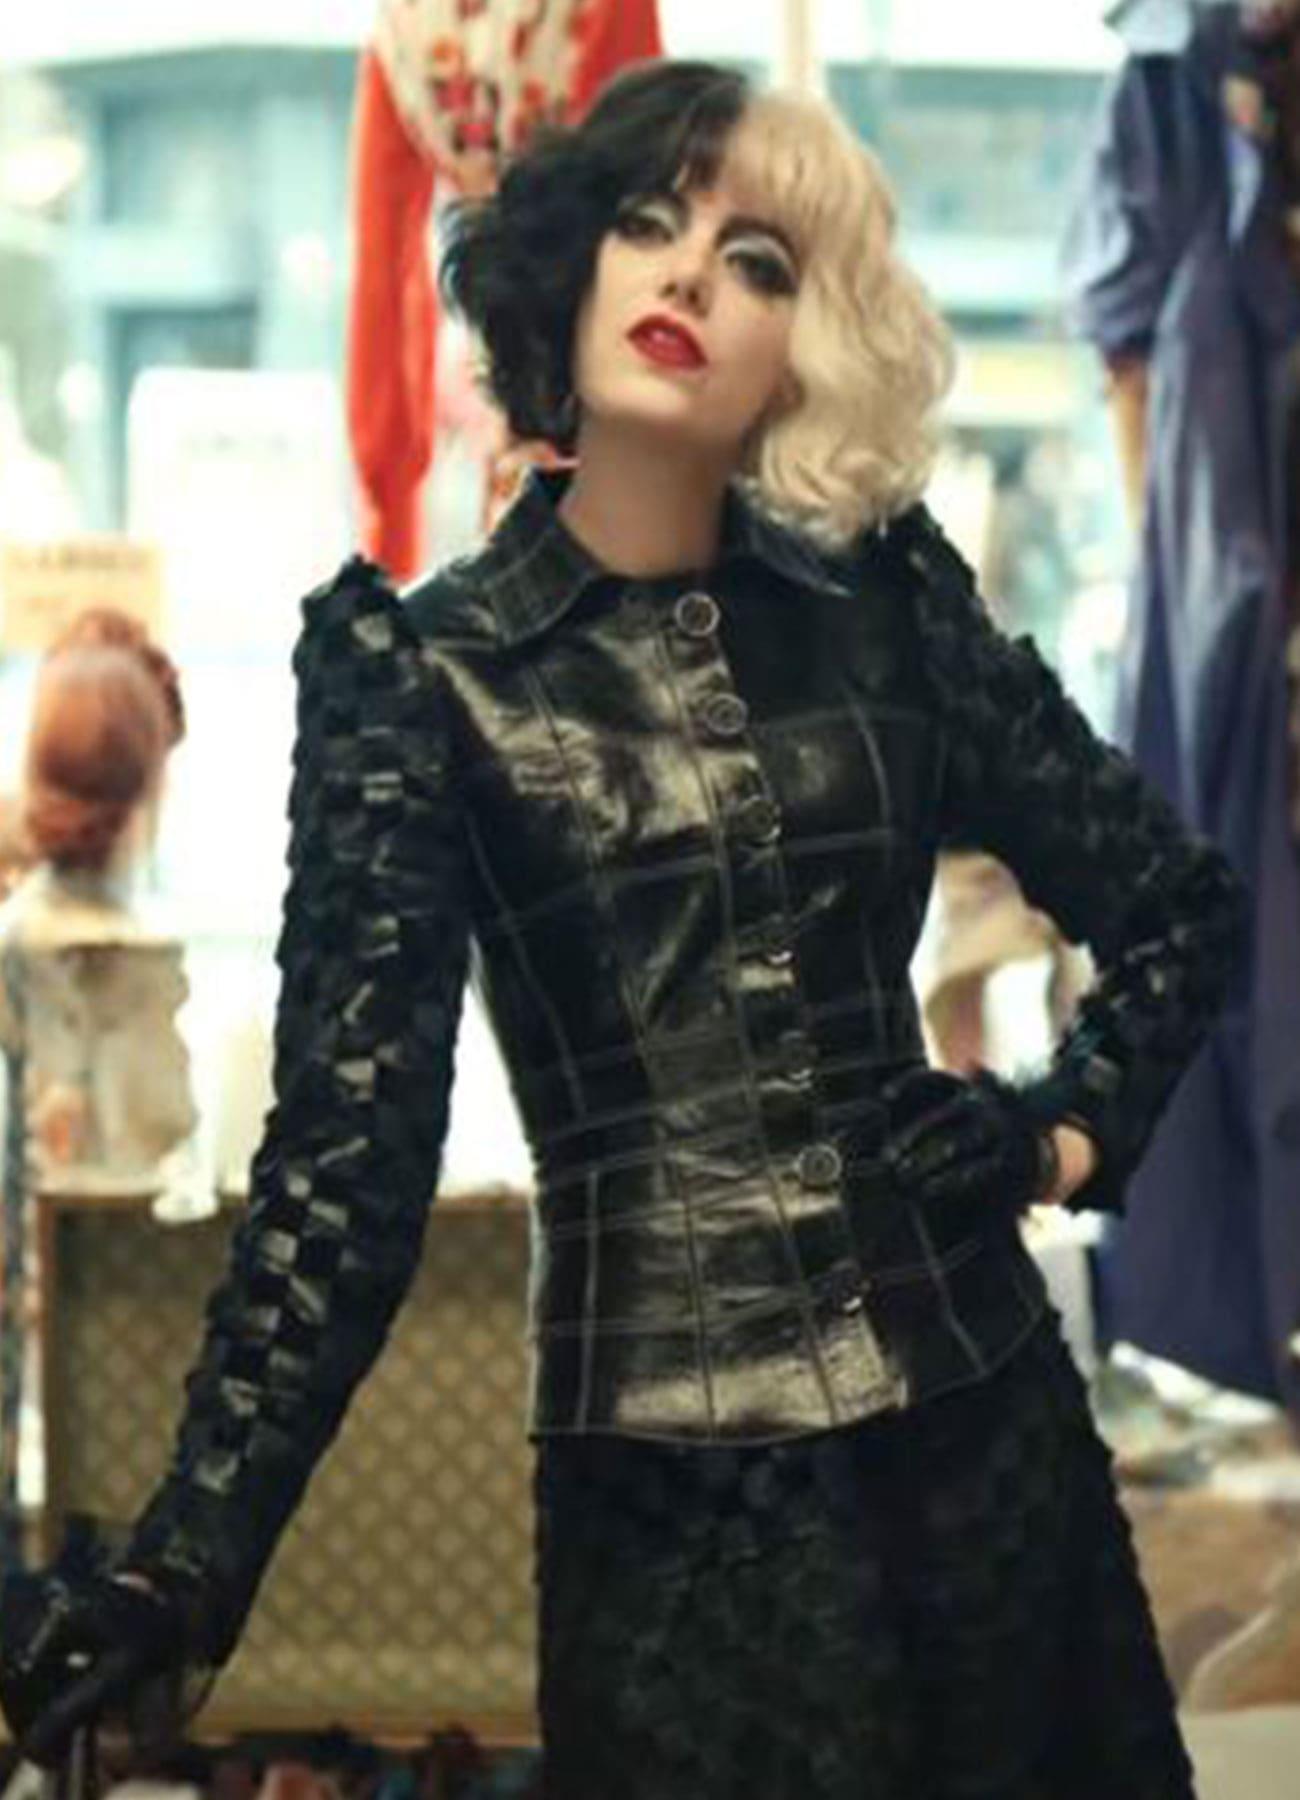 Cruella De Vil Stylish Black Faux Leather Jacket